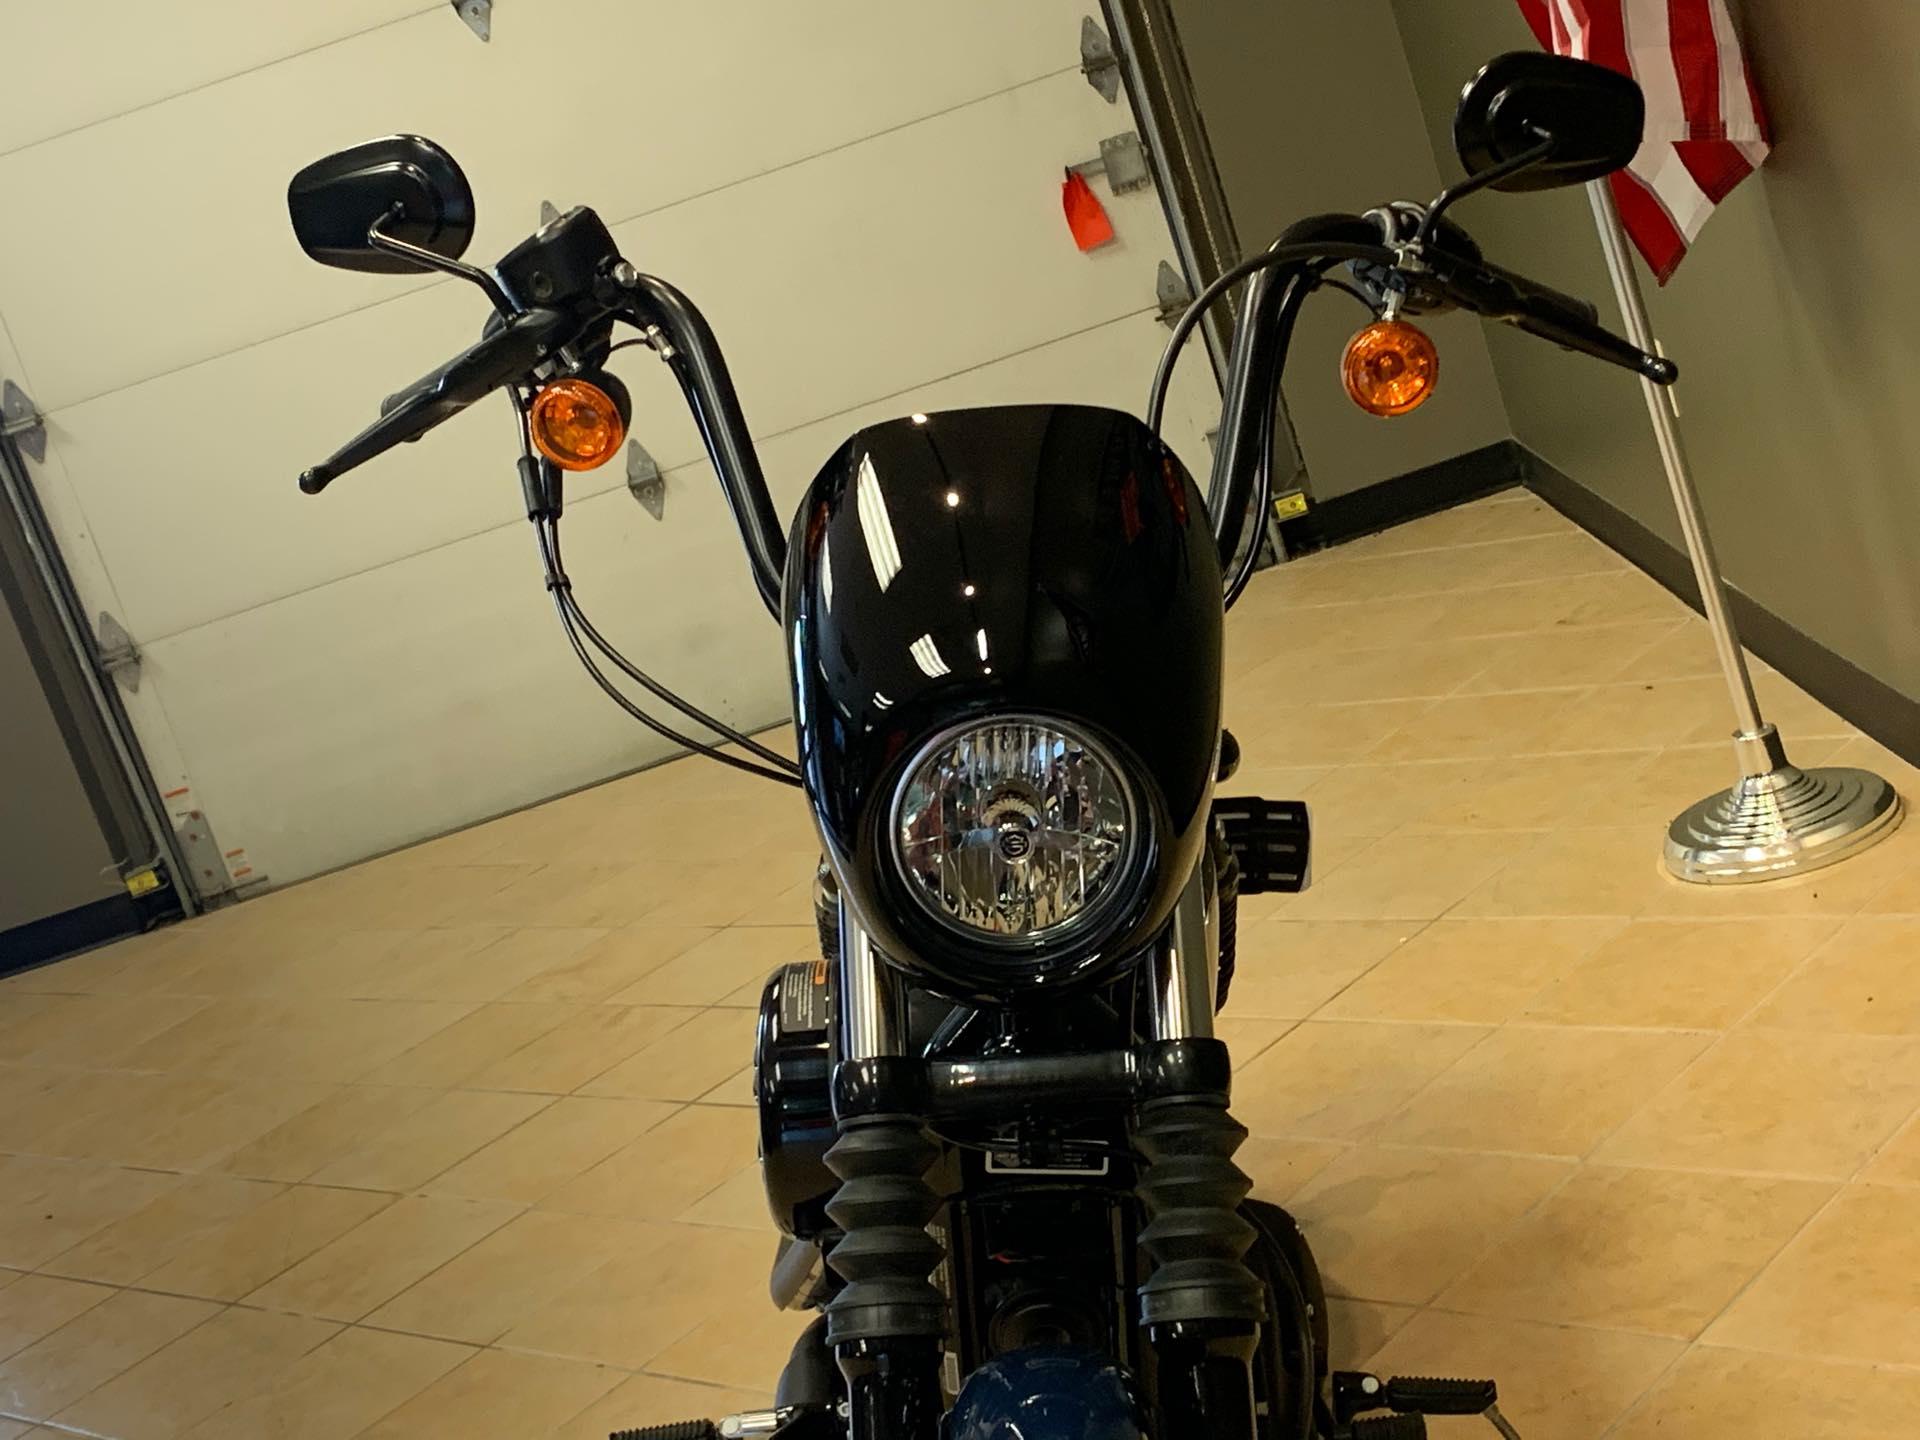 2020 Harley-Davidson Sportster Iron 1200 at Loess Hills Harley-Davidson